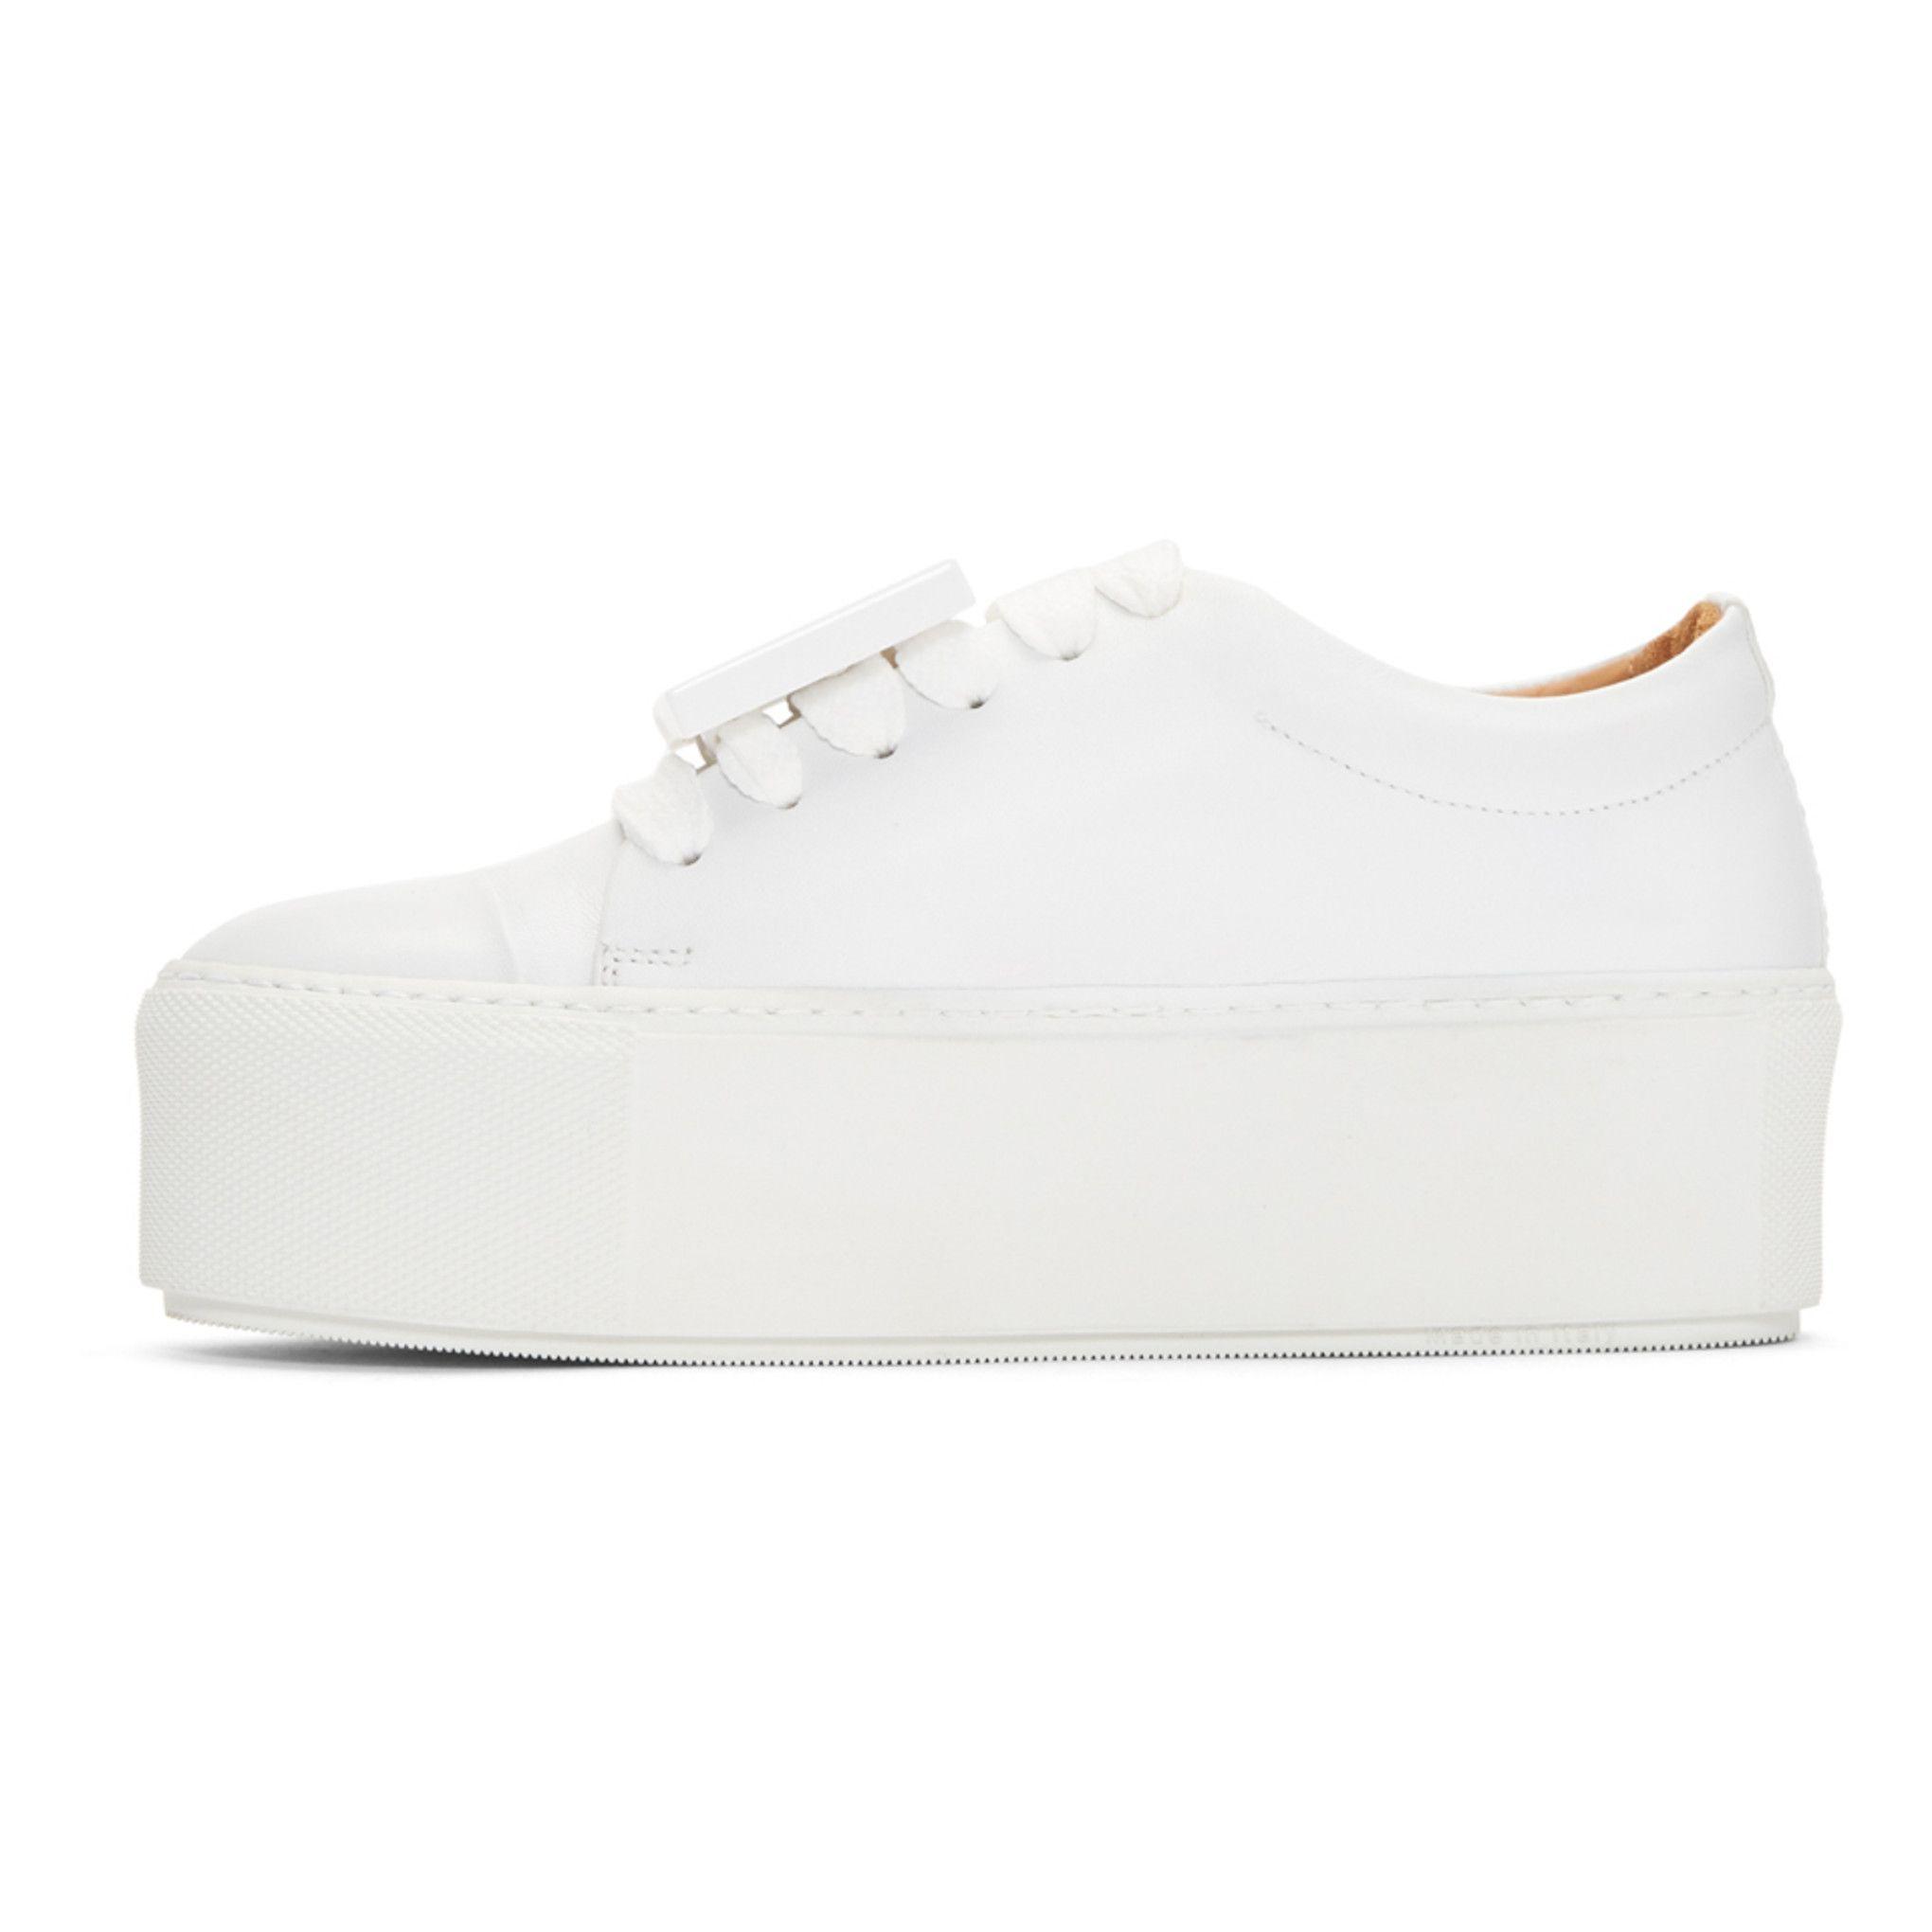 White Drihanna Platform Sneakers Acne Studios cKT6t1Q